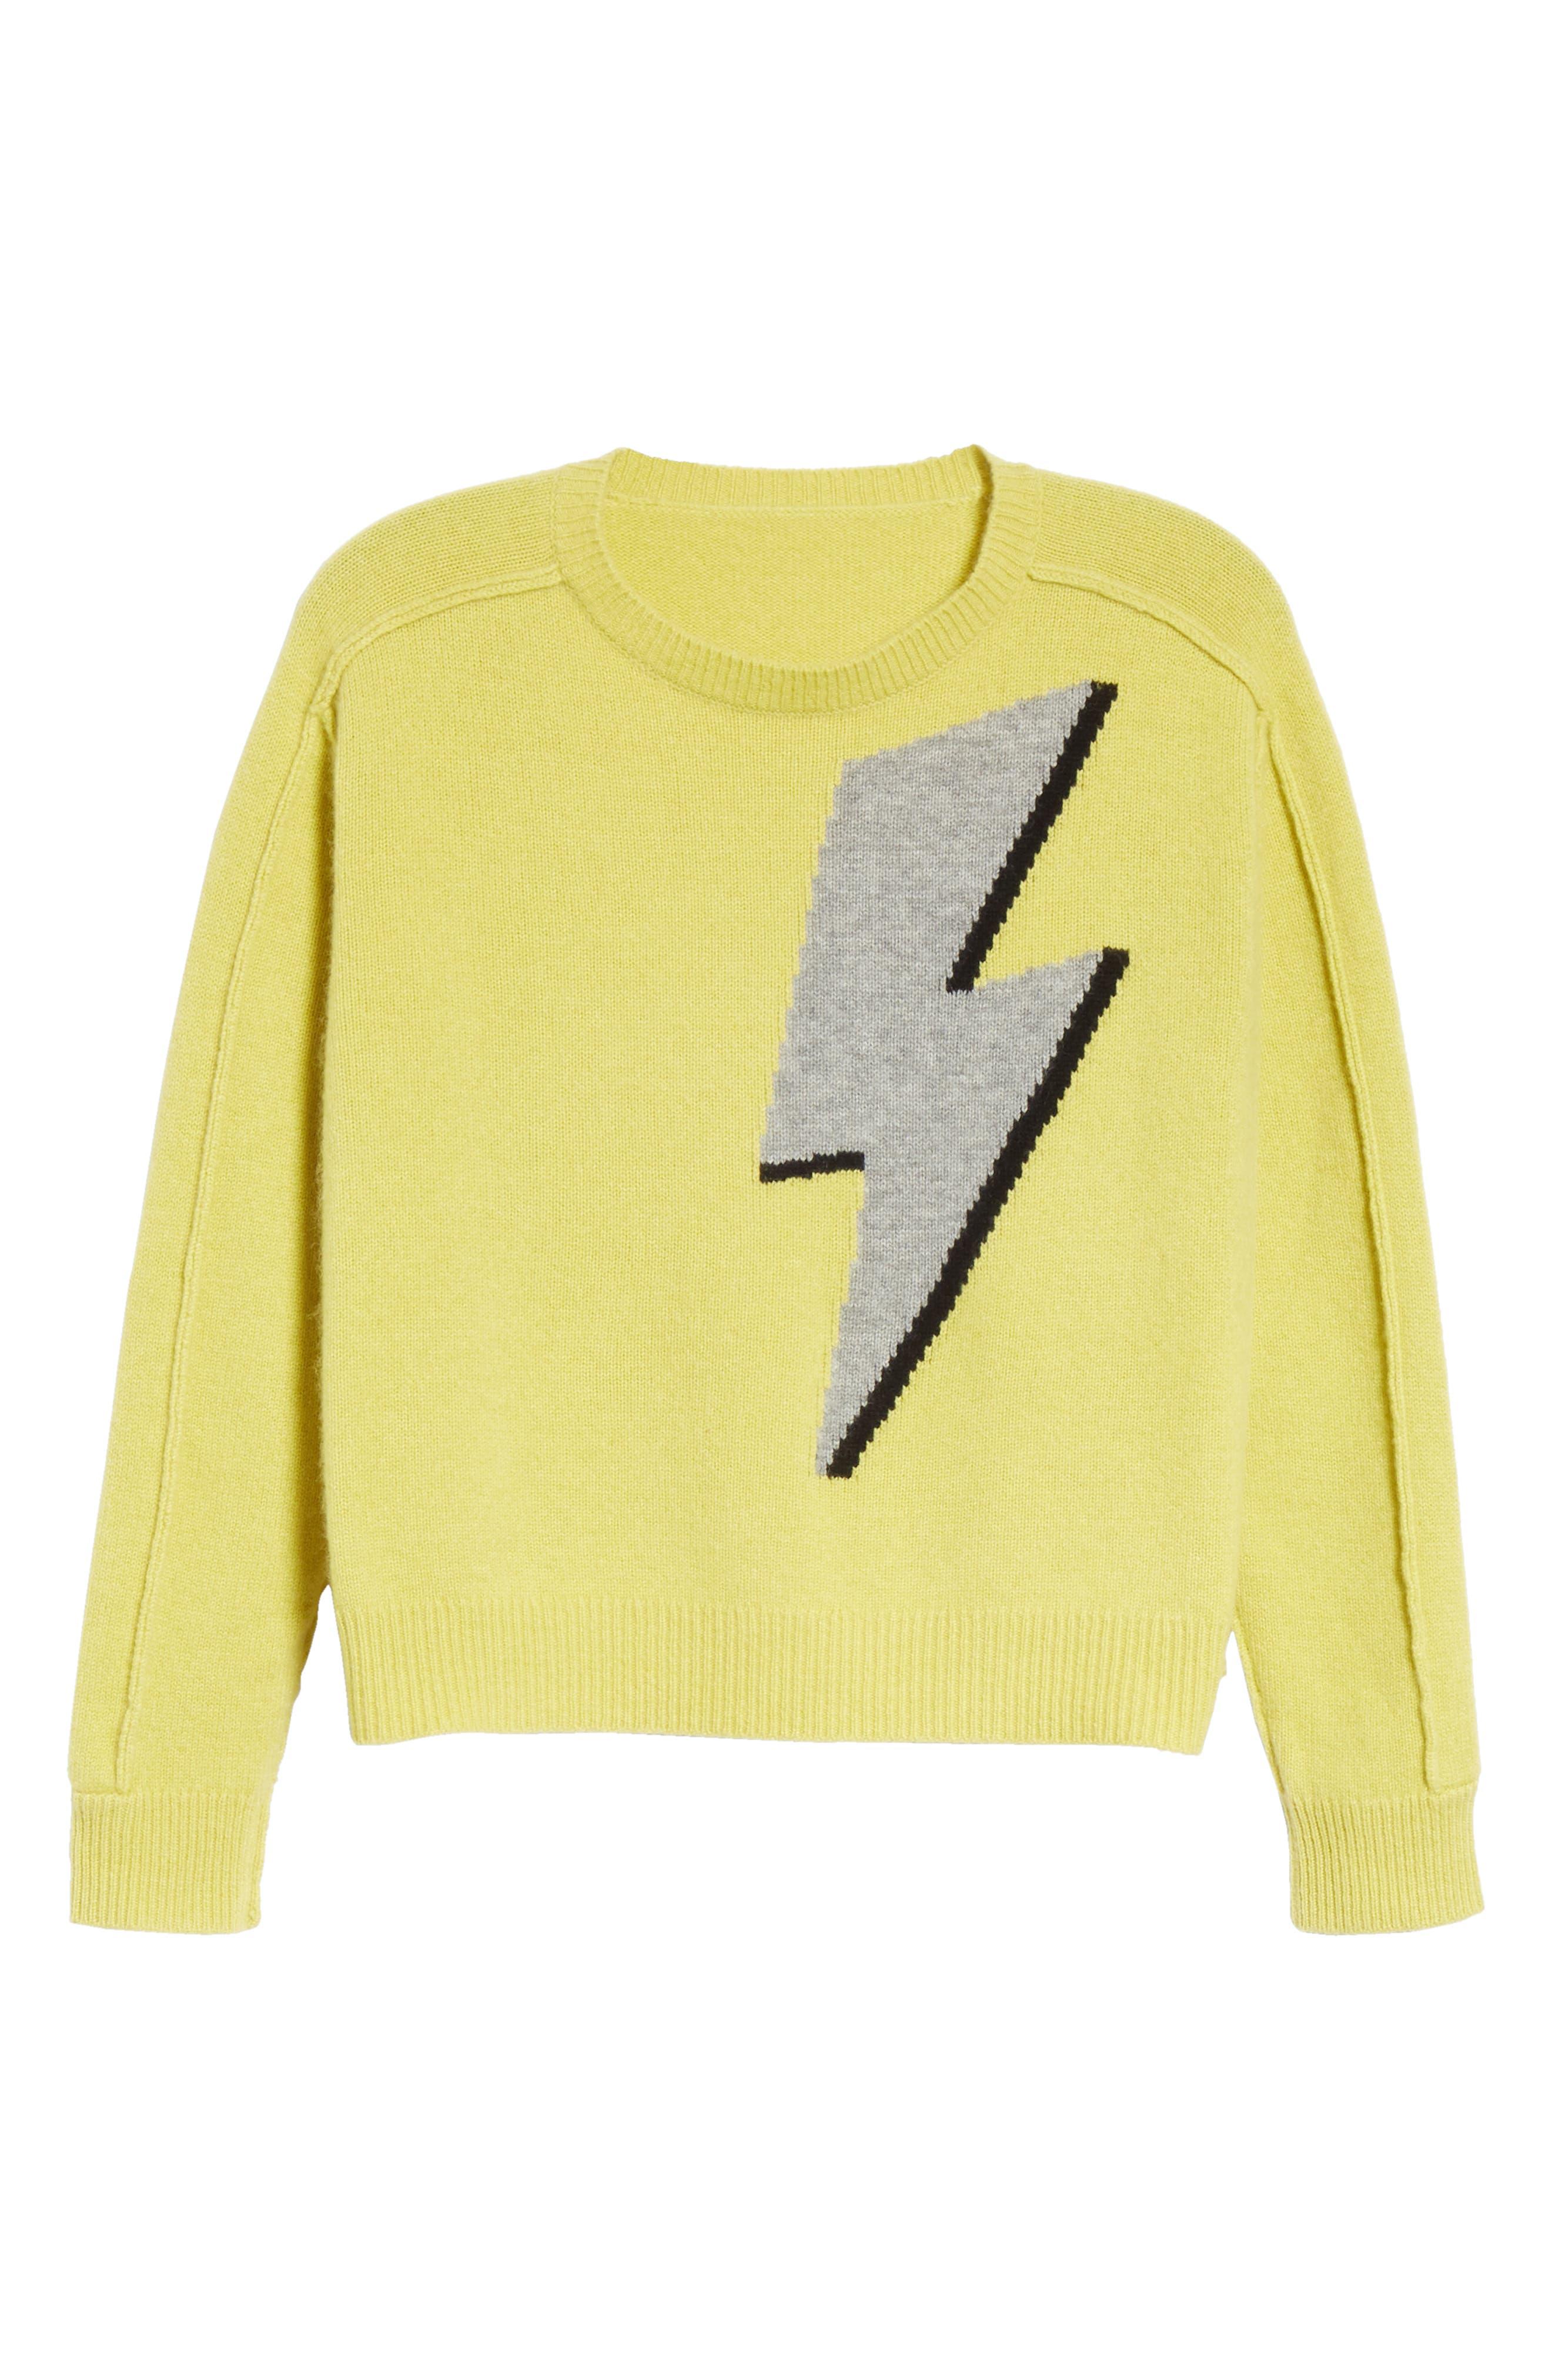 Lightning Bolt Wool & Cashmere Sweater,                             Alternate thumbnail 5, color,                             720